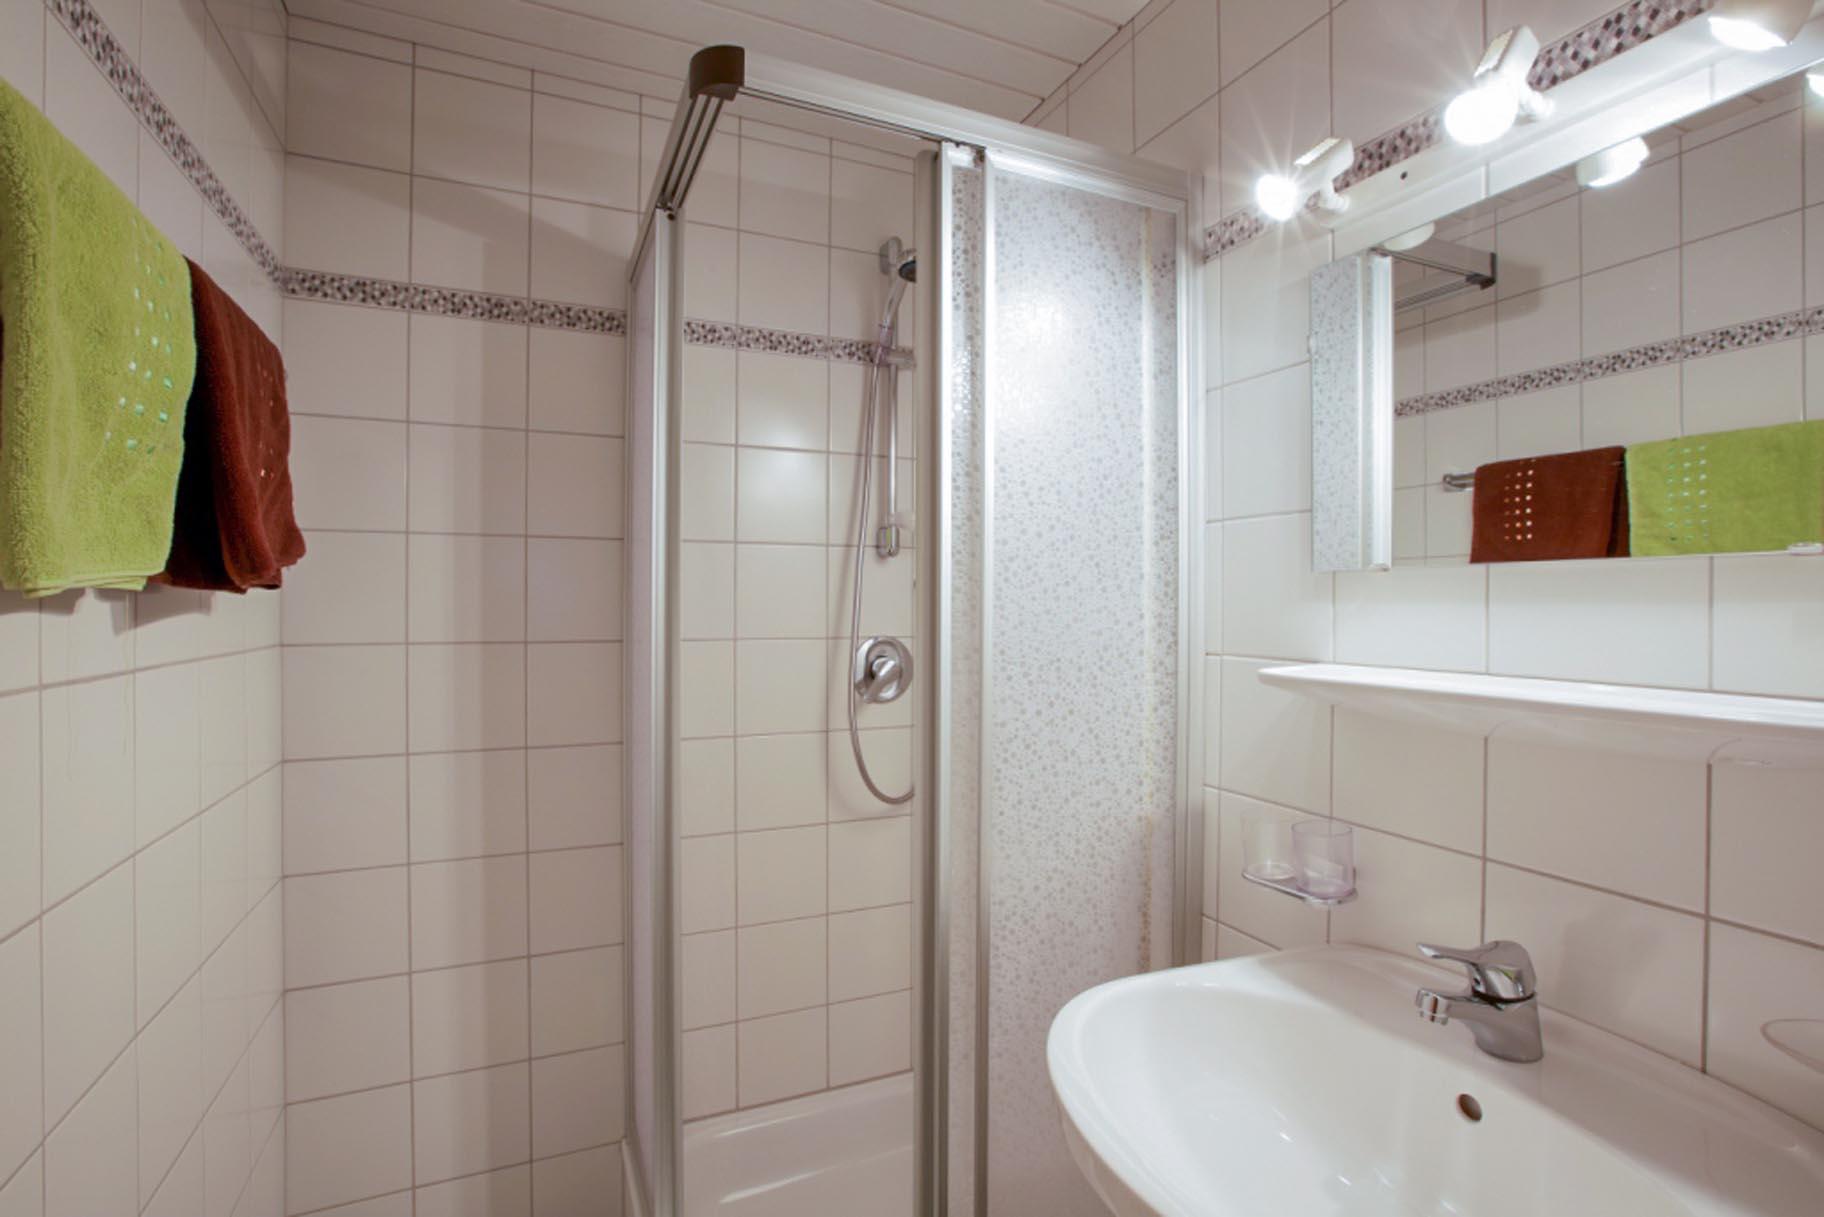 Apartment 3, bathroom